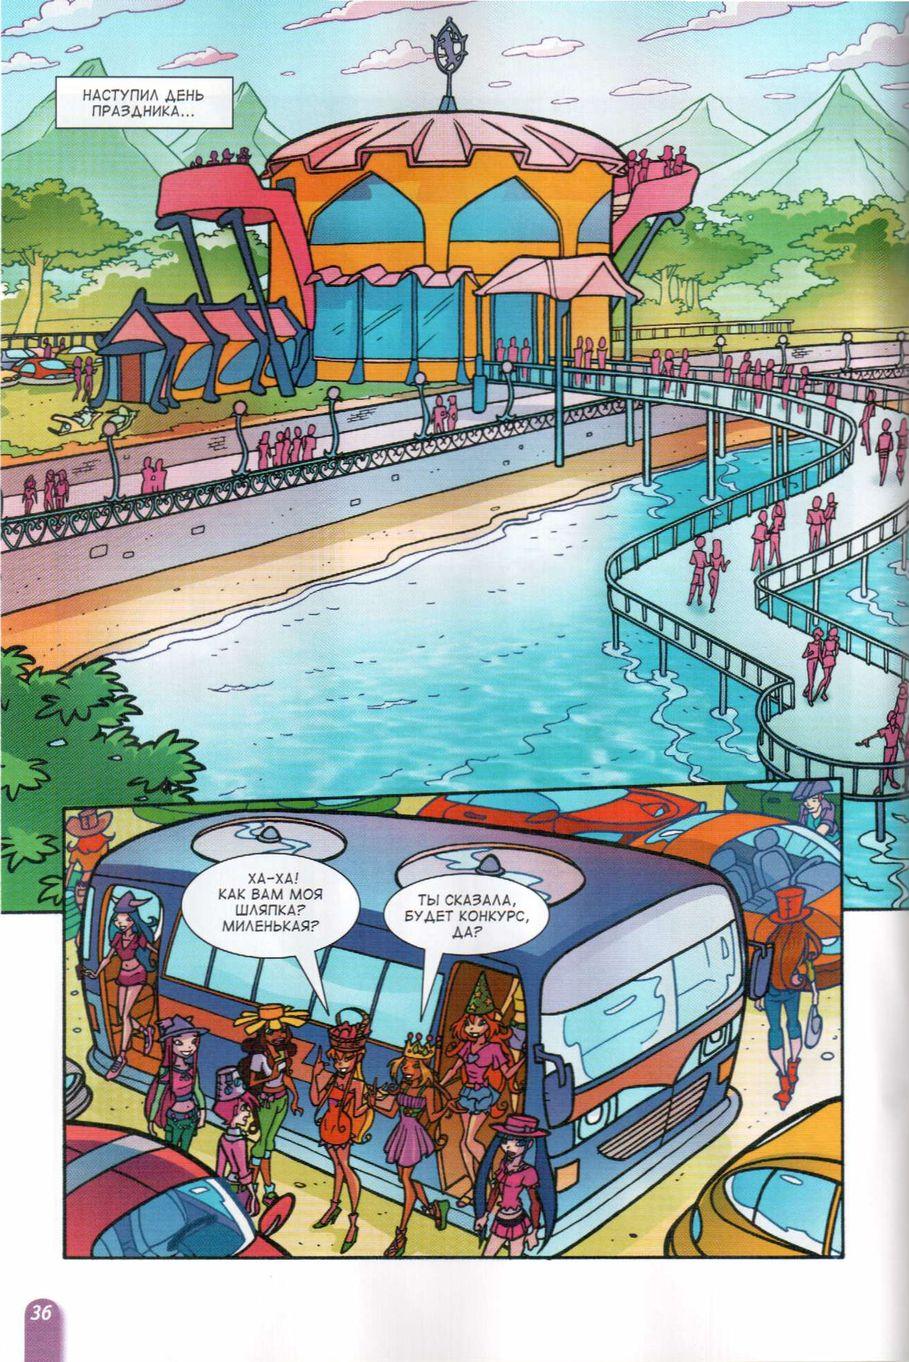 Комикс Винкс Winx - Любовь и ревность (Журнал Винкс №7 2011) - стр. 36